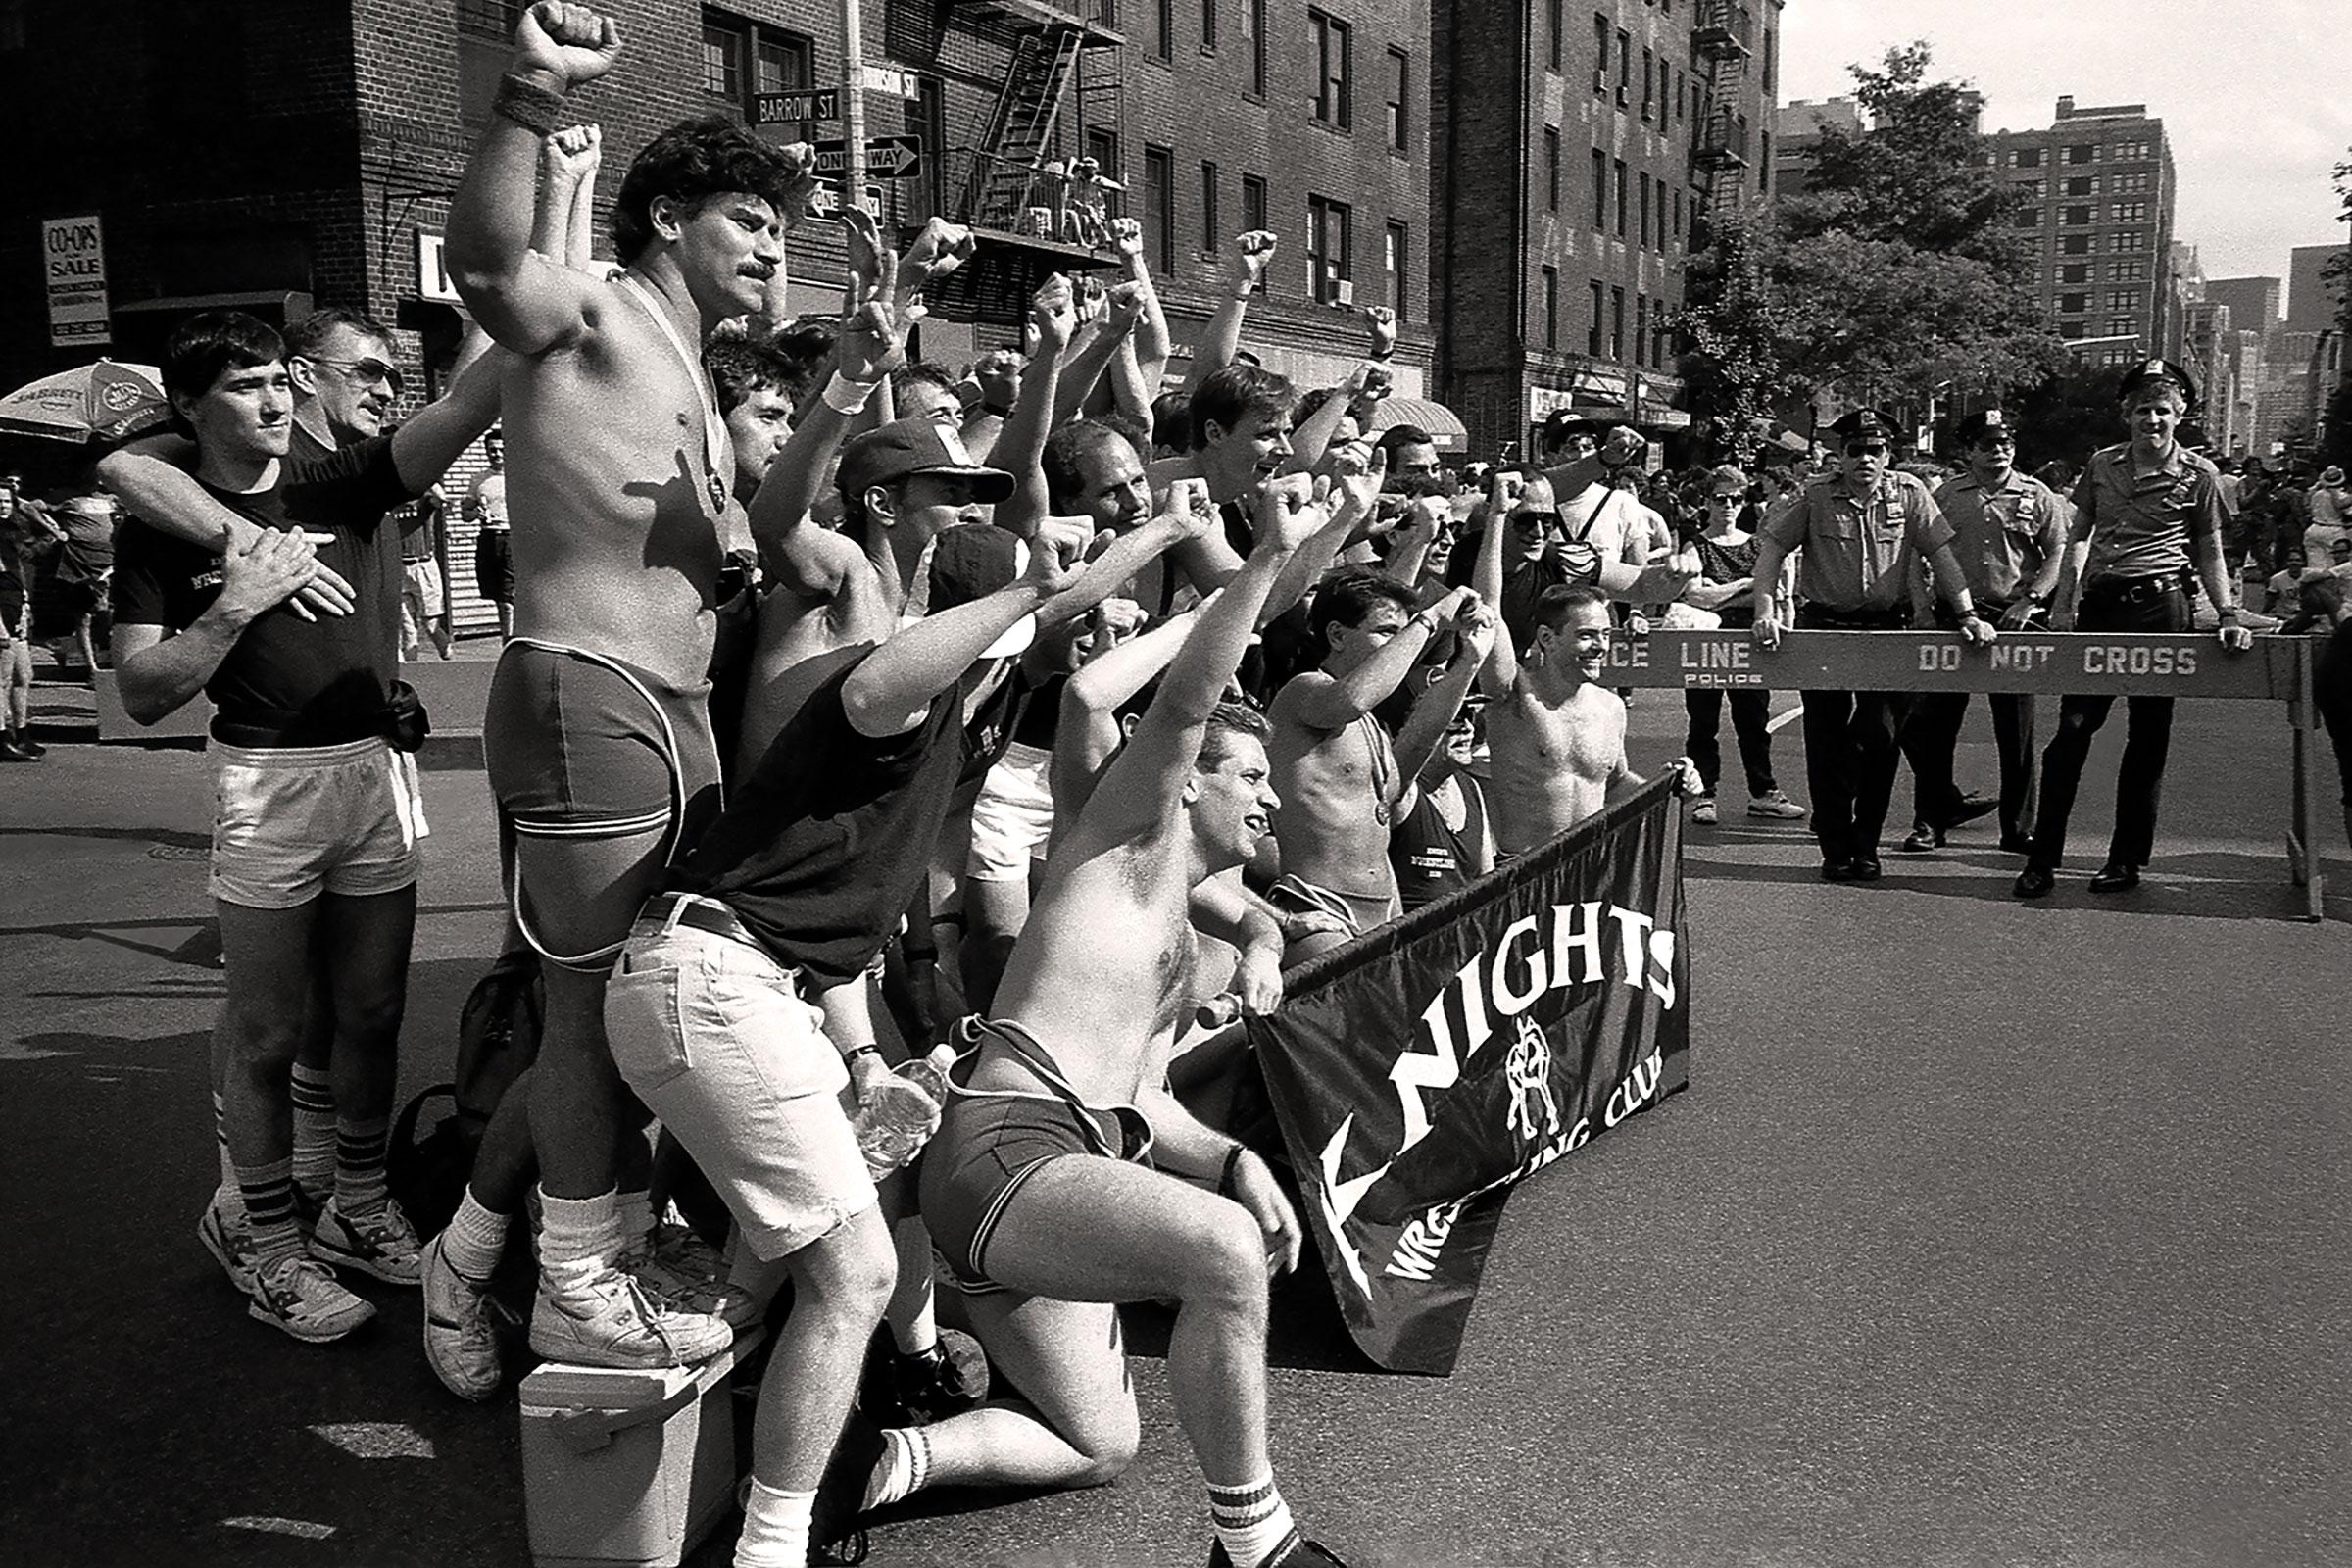 Knights Wrestling Team, Hudson Street, NYC, 1990